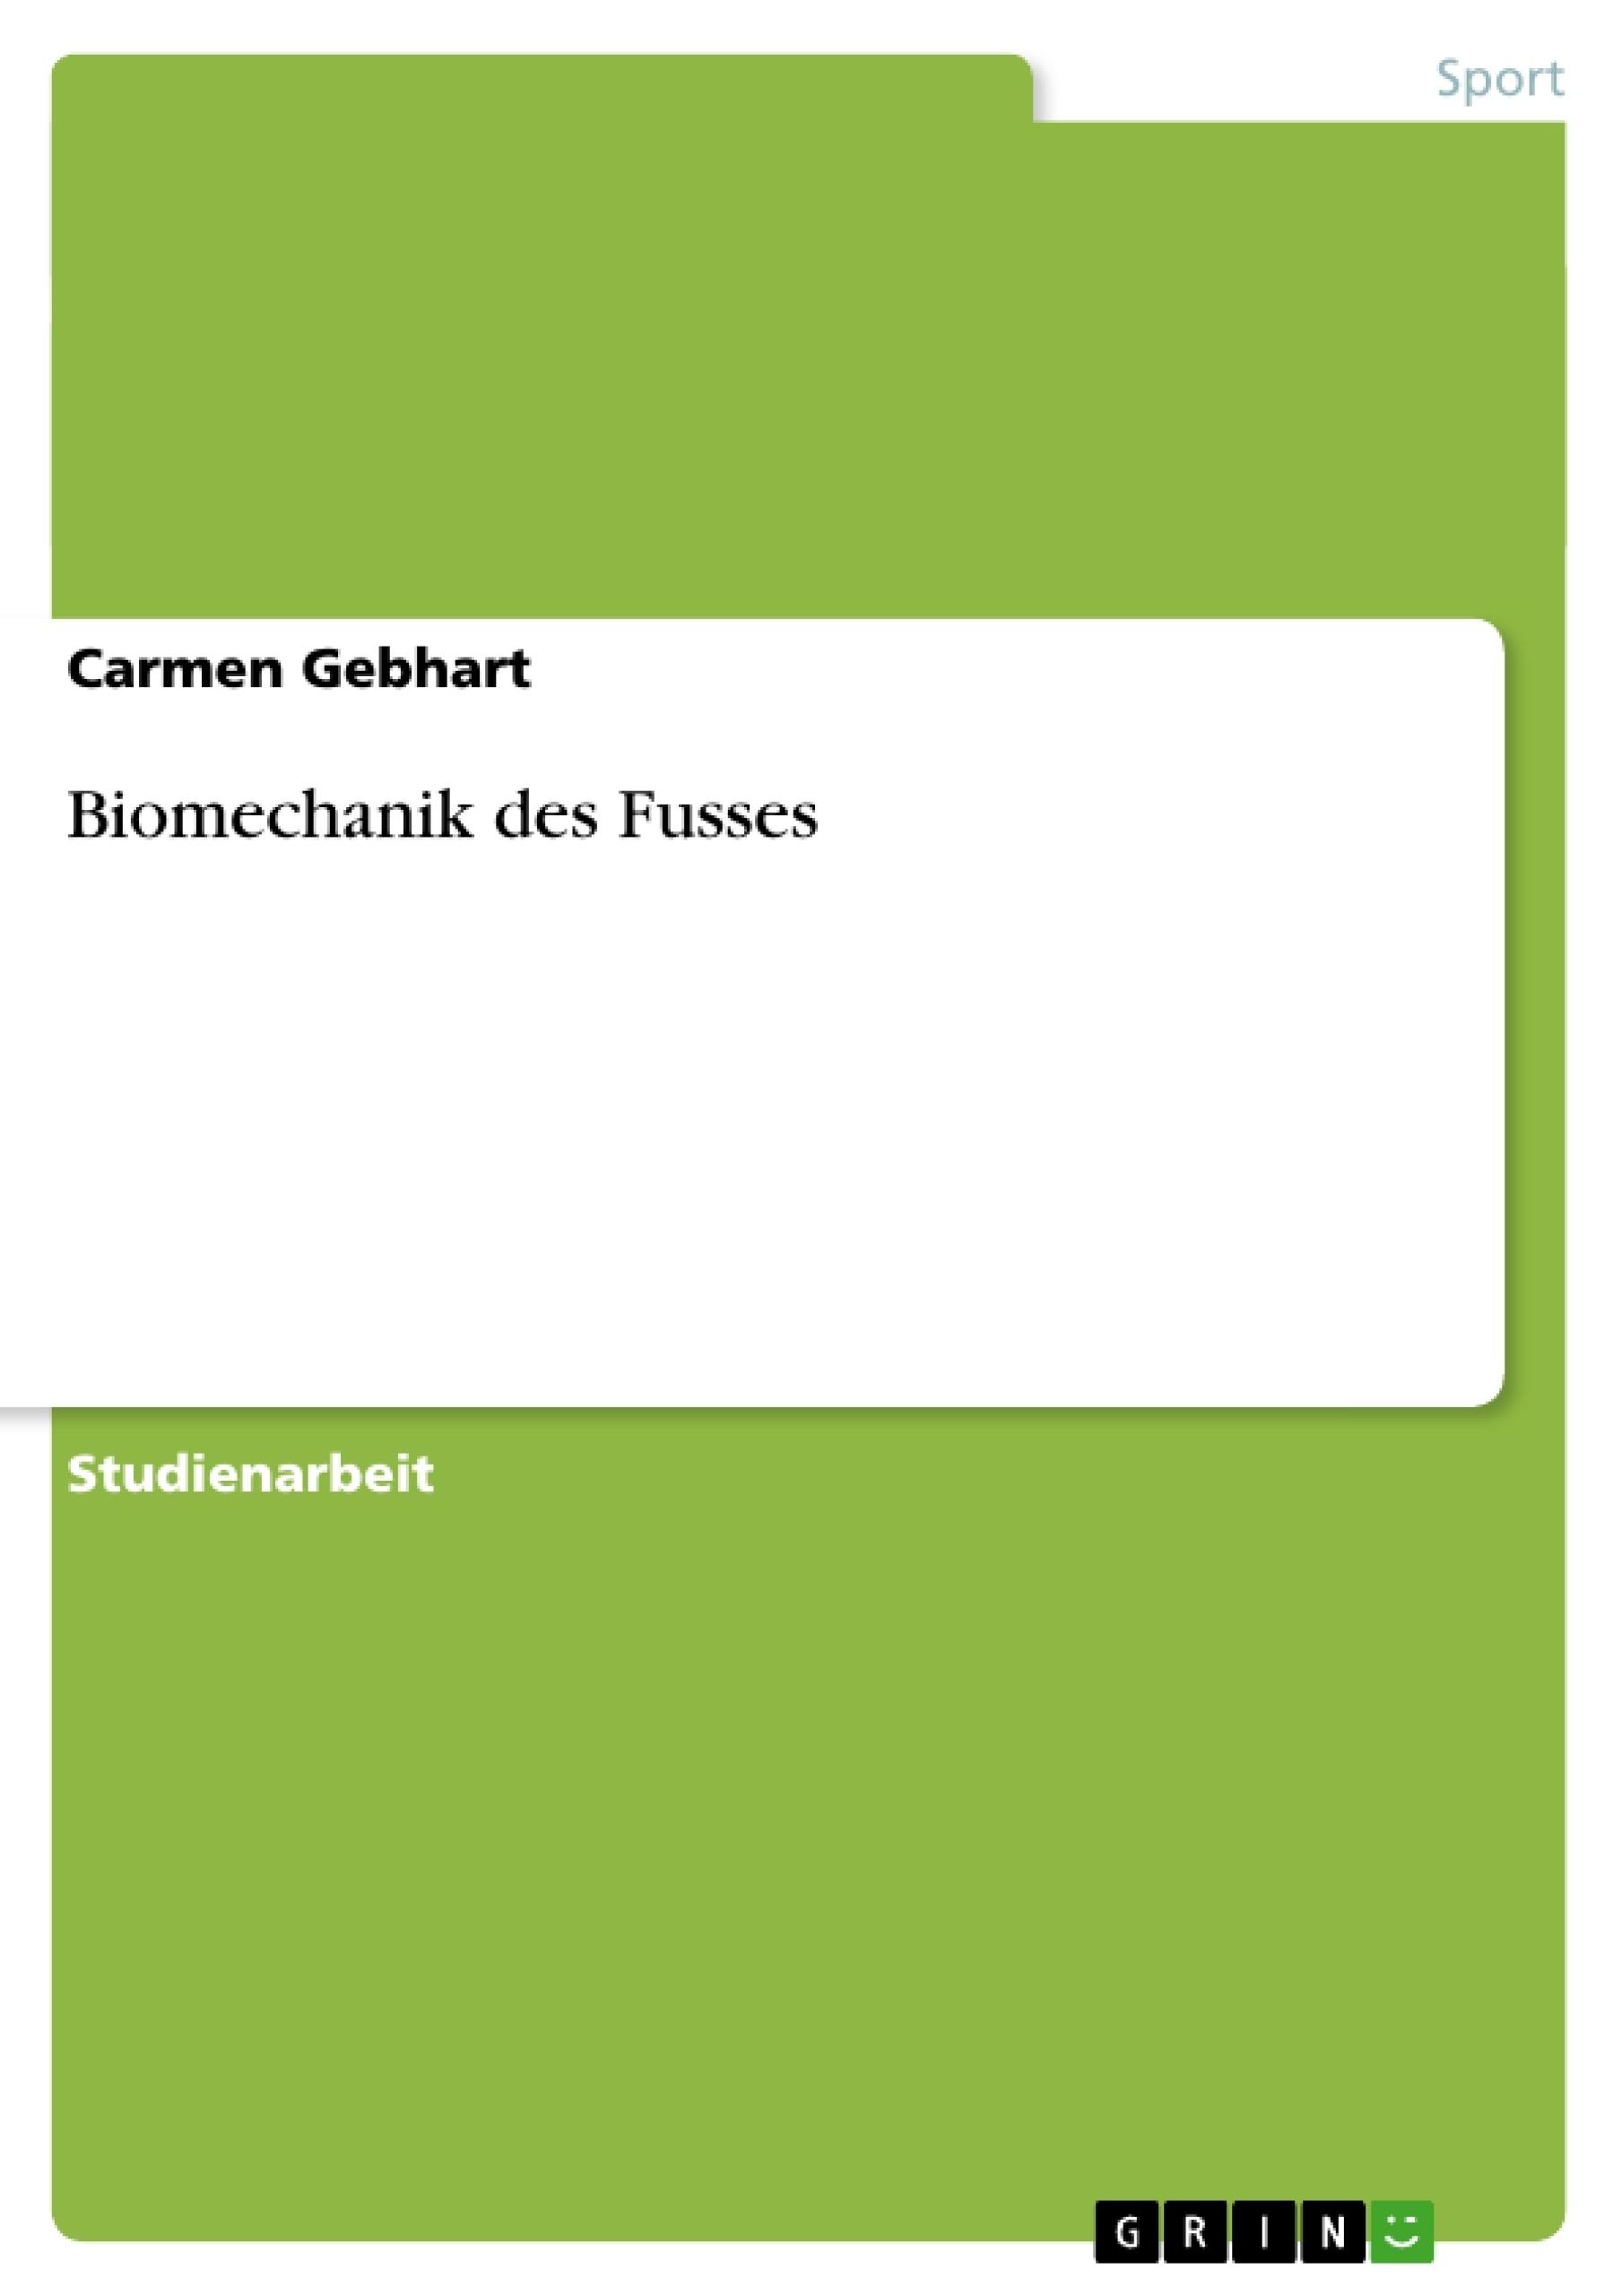 Biomechanik des Fusses | Masterarbeit, Hausarbeit, Bachelorarbeit ...